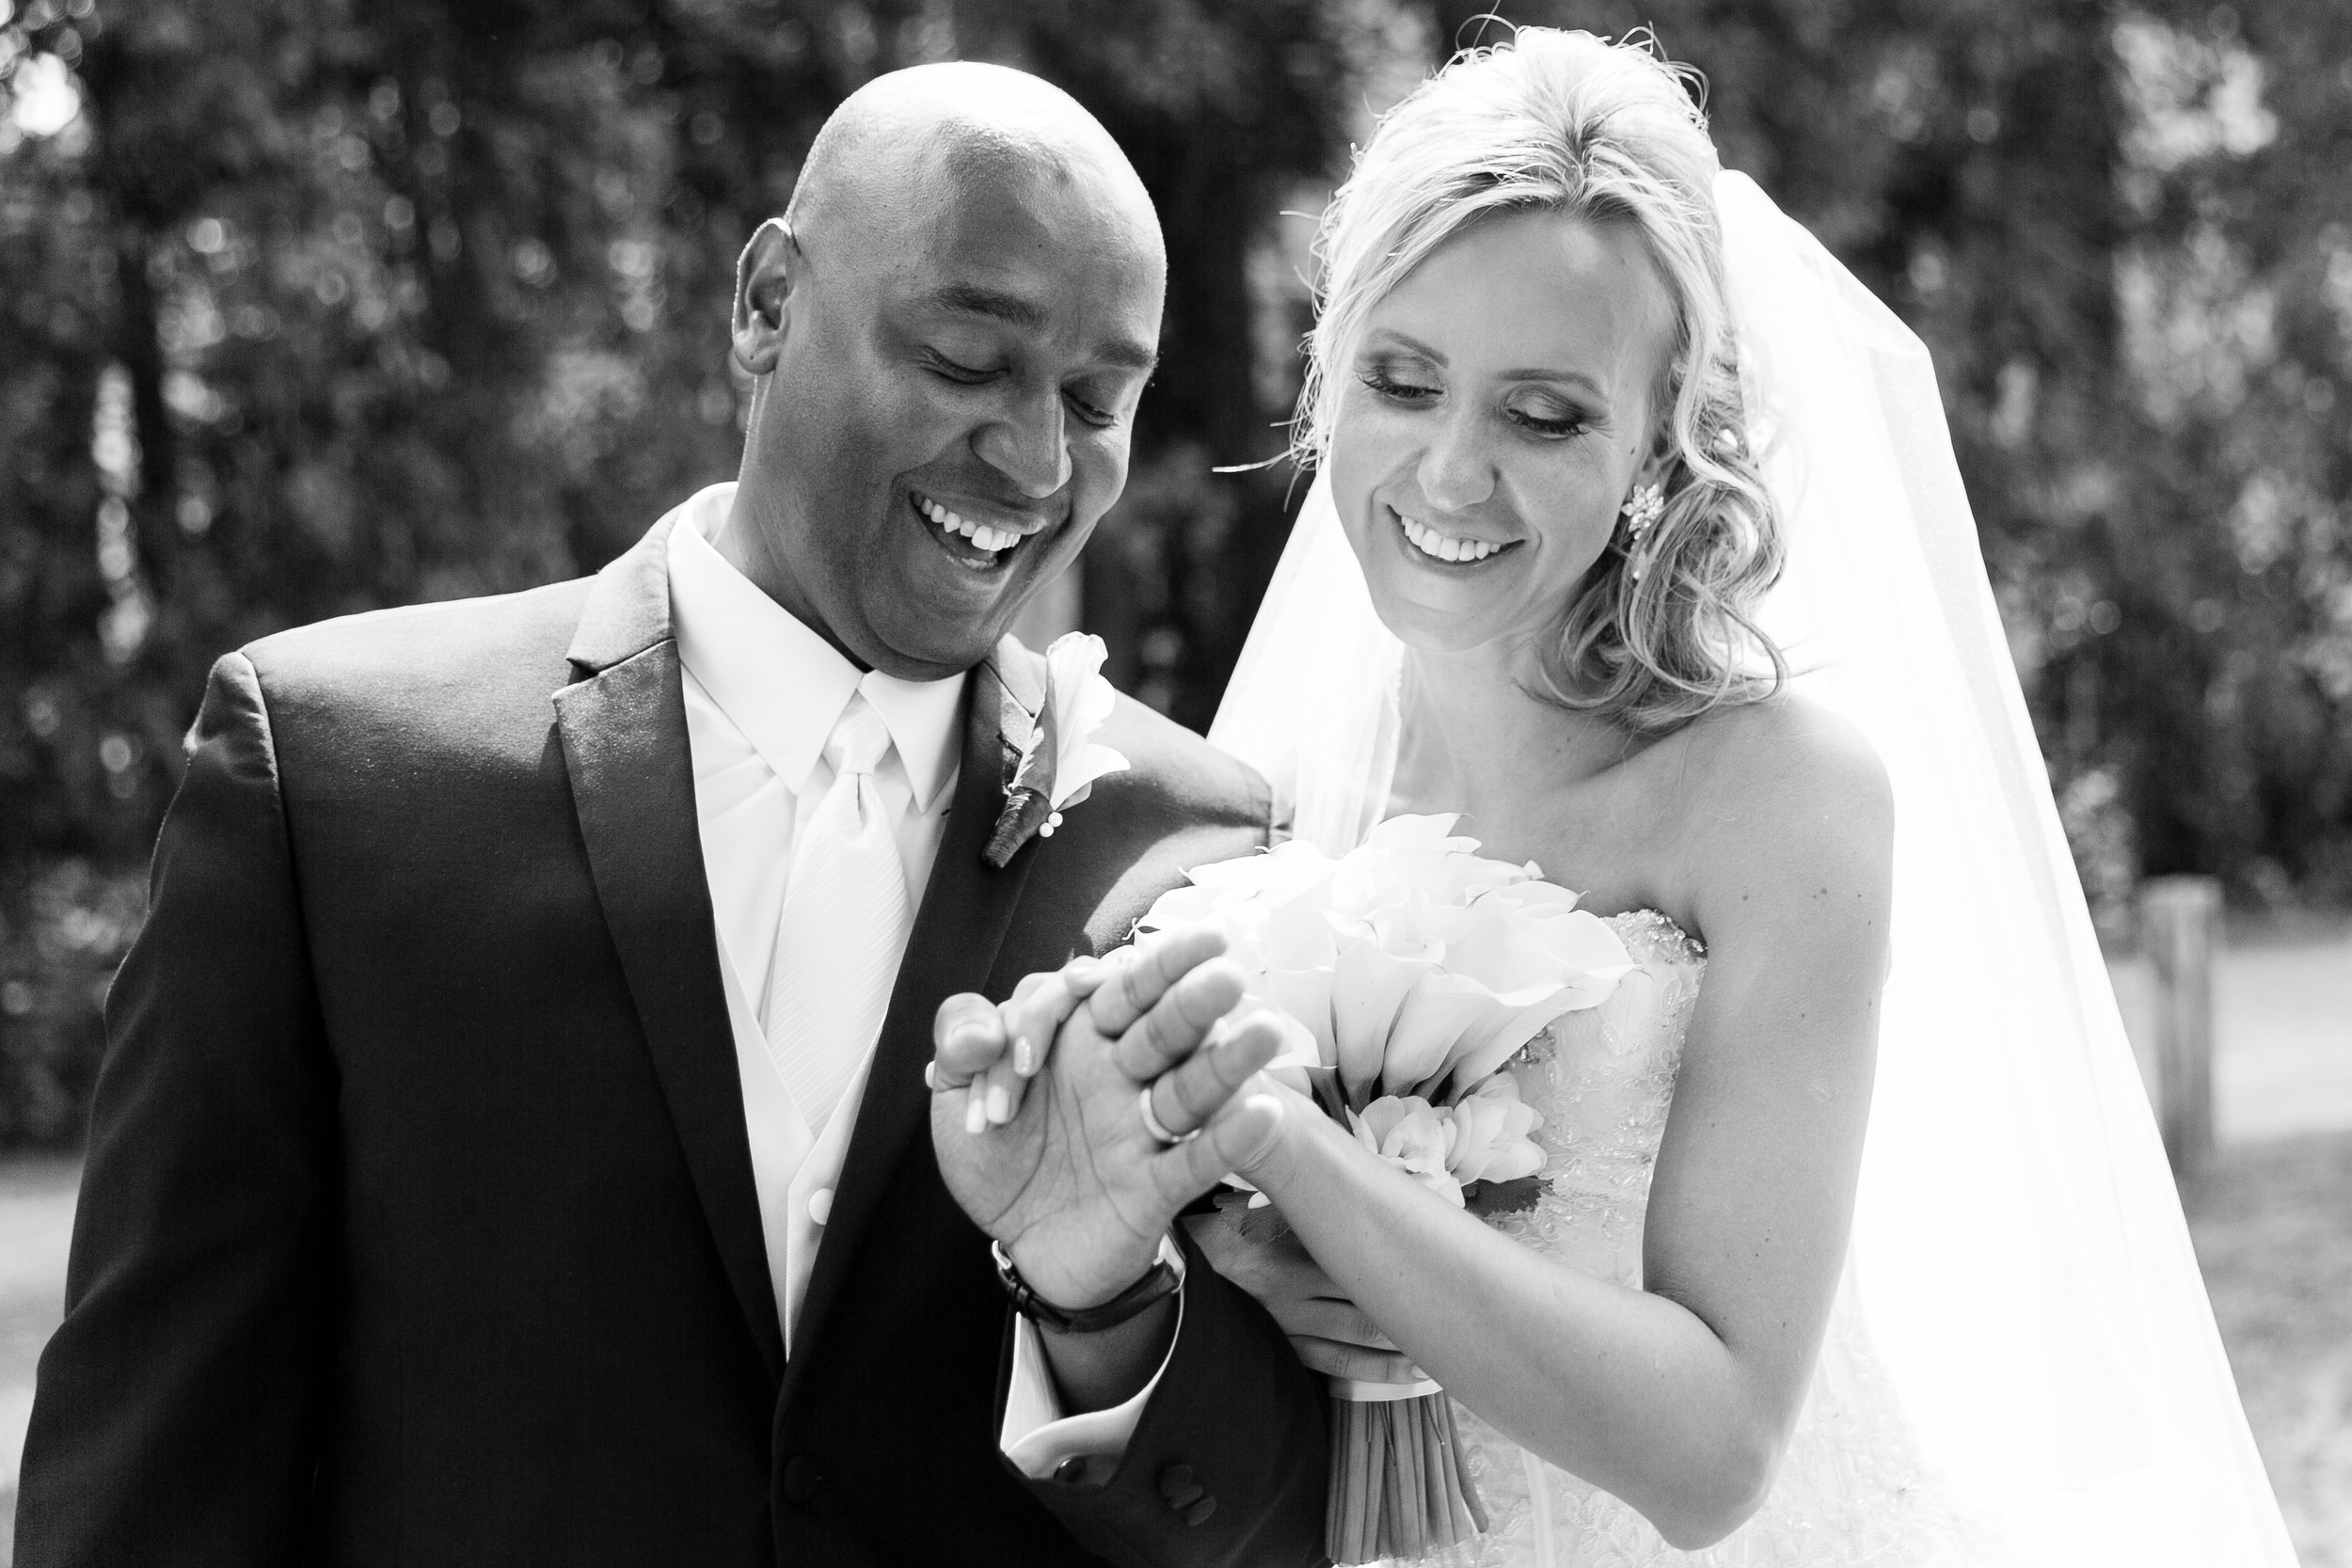 Elegant-American-Wedding-Harkness-Mystic-CT-Documentary-Wedding-Photographer-Jacek-Dolata-9.jpg